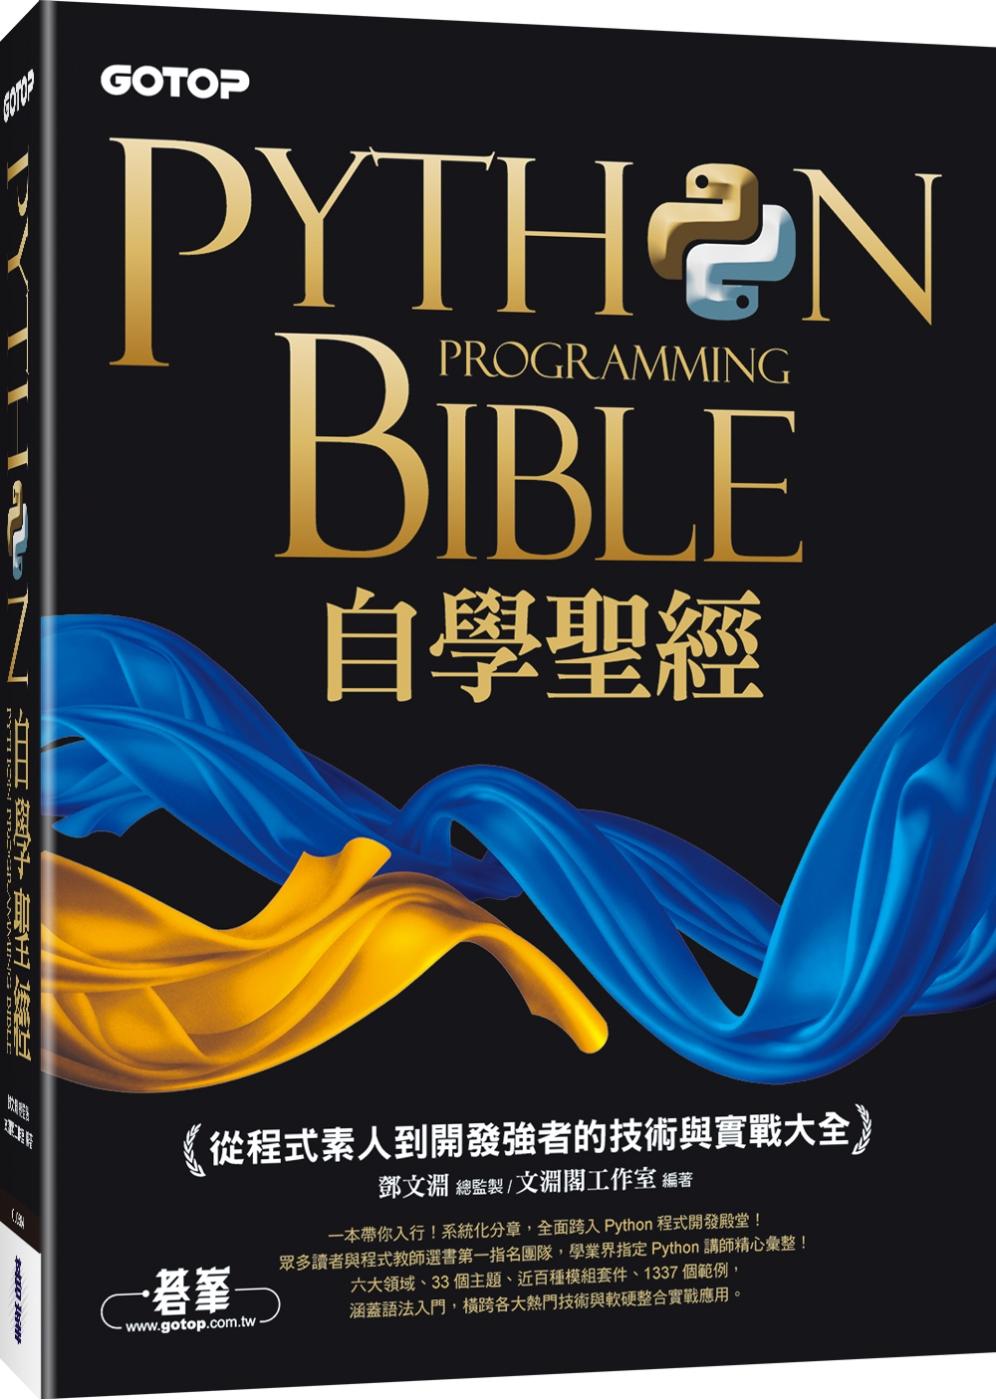 Python自學聖經:從程式素人到開發強者的技術與實戰大全!